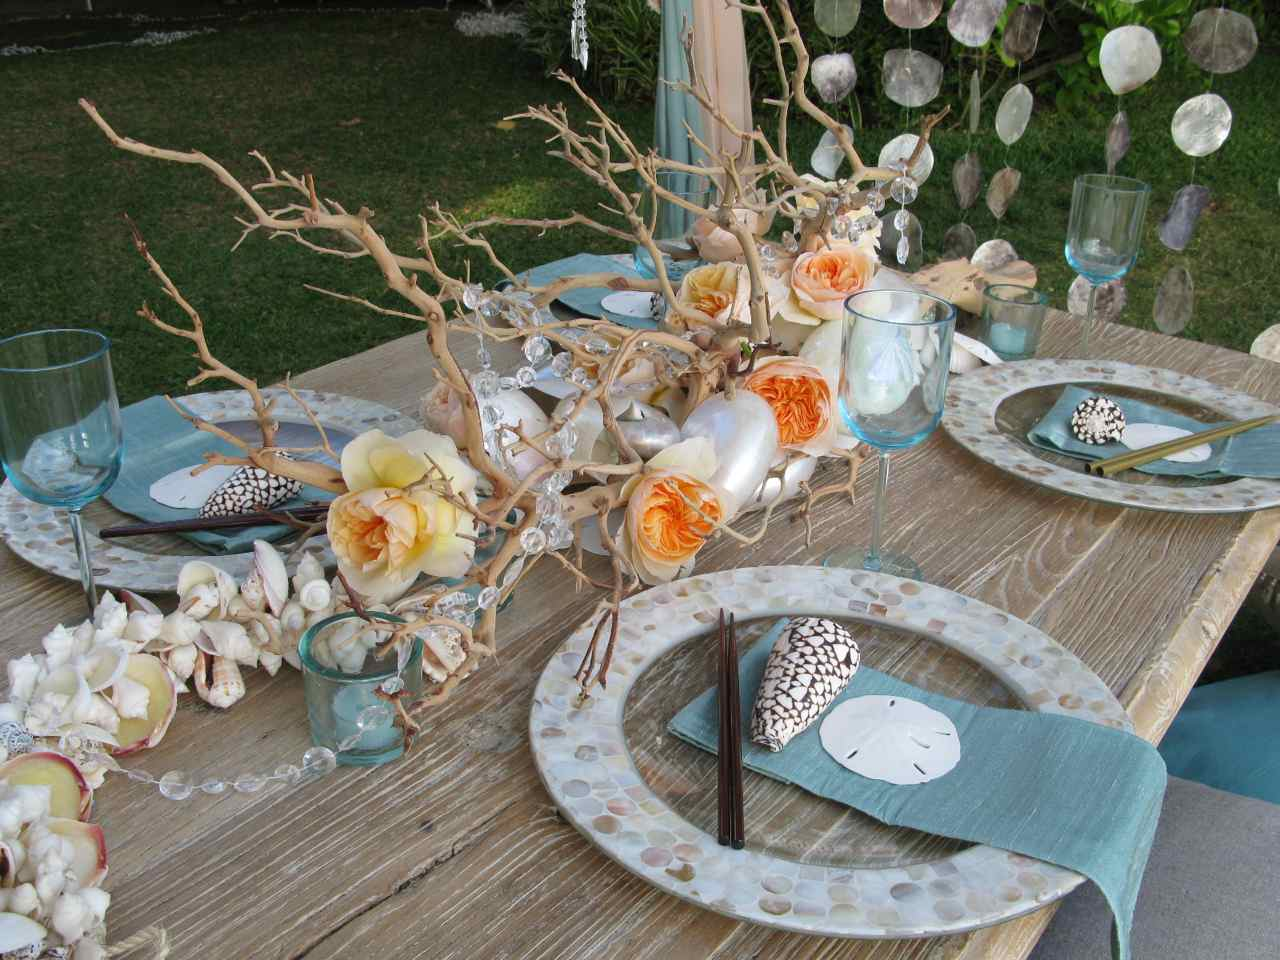 Decora tu mesa de verano de forma original